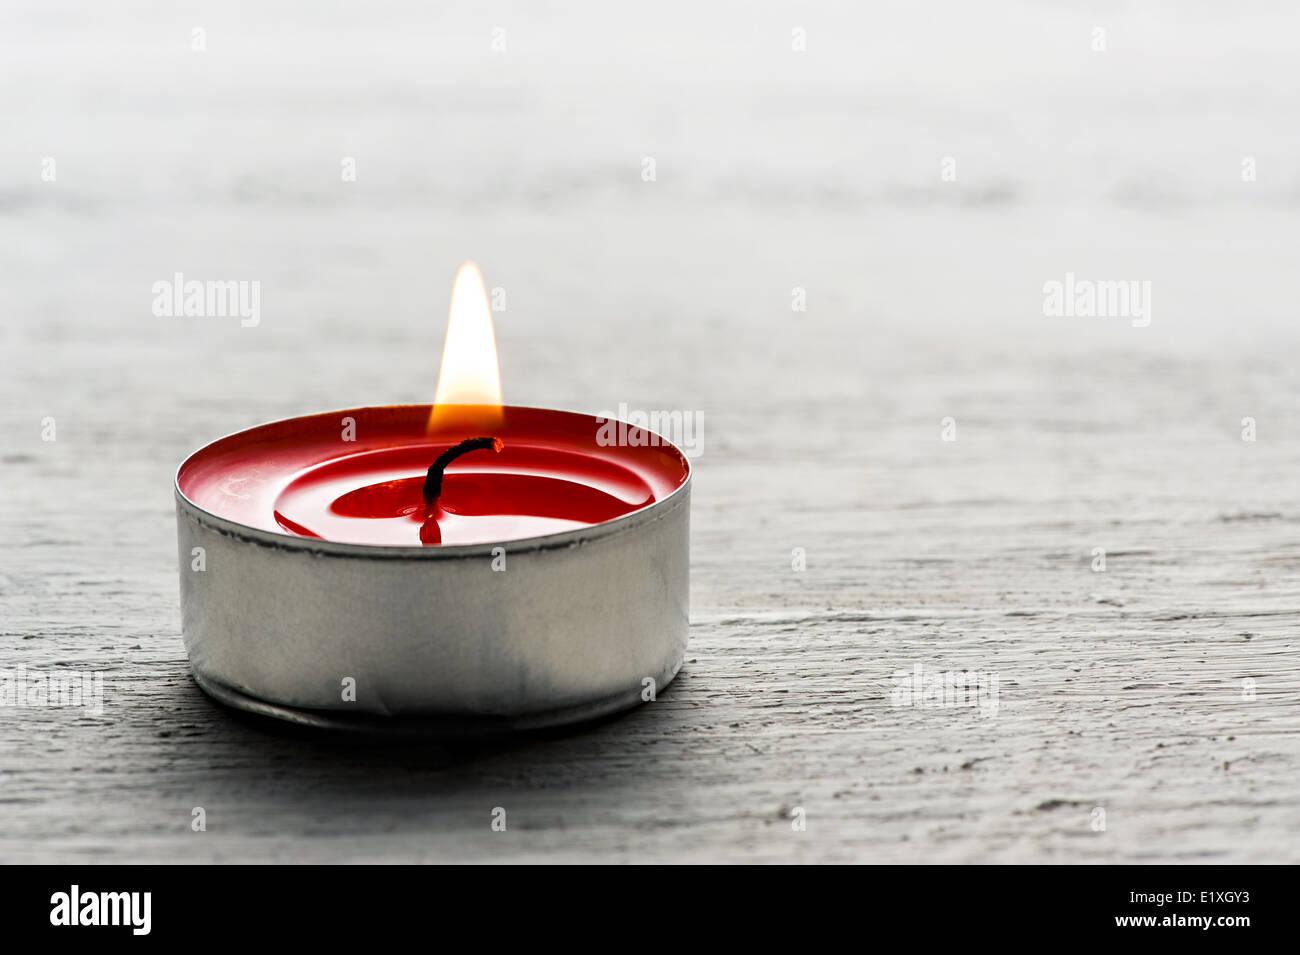 Single burning red tealight candle - Stock Image